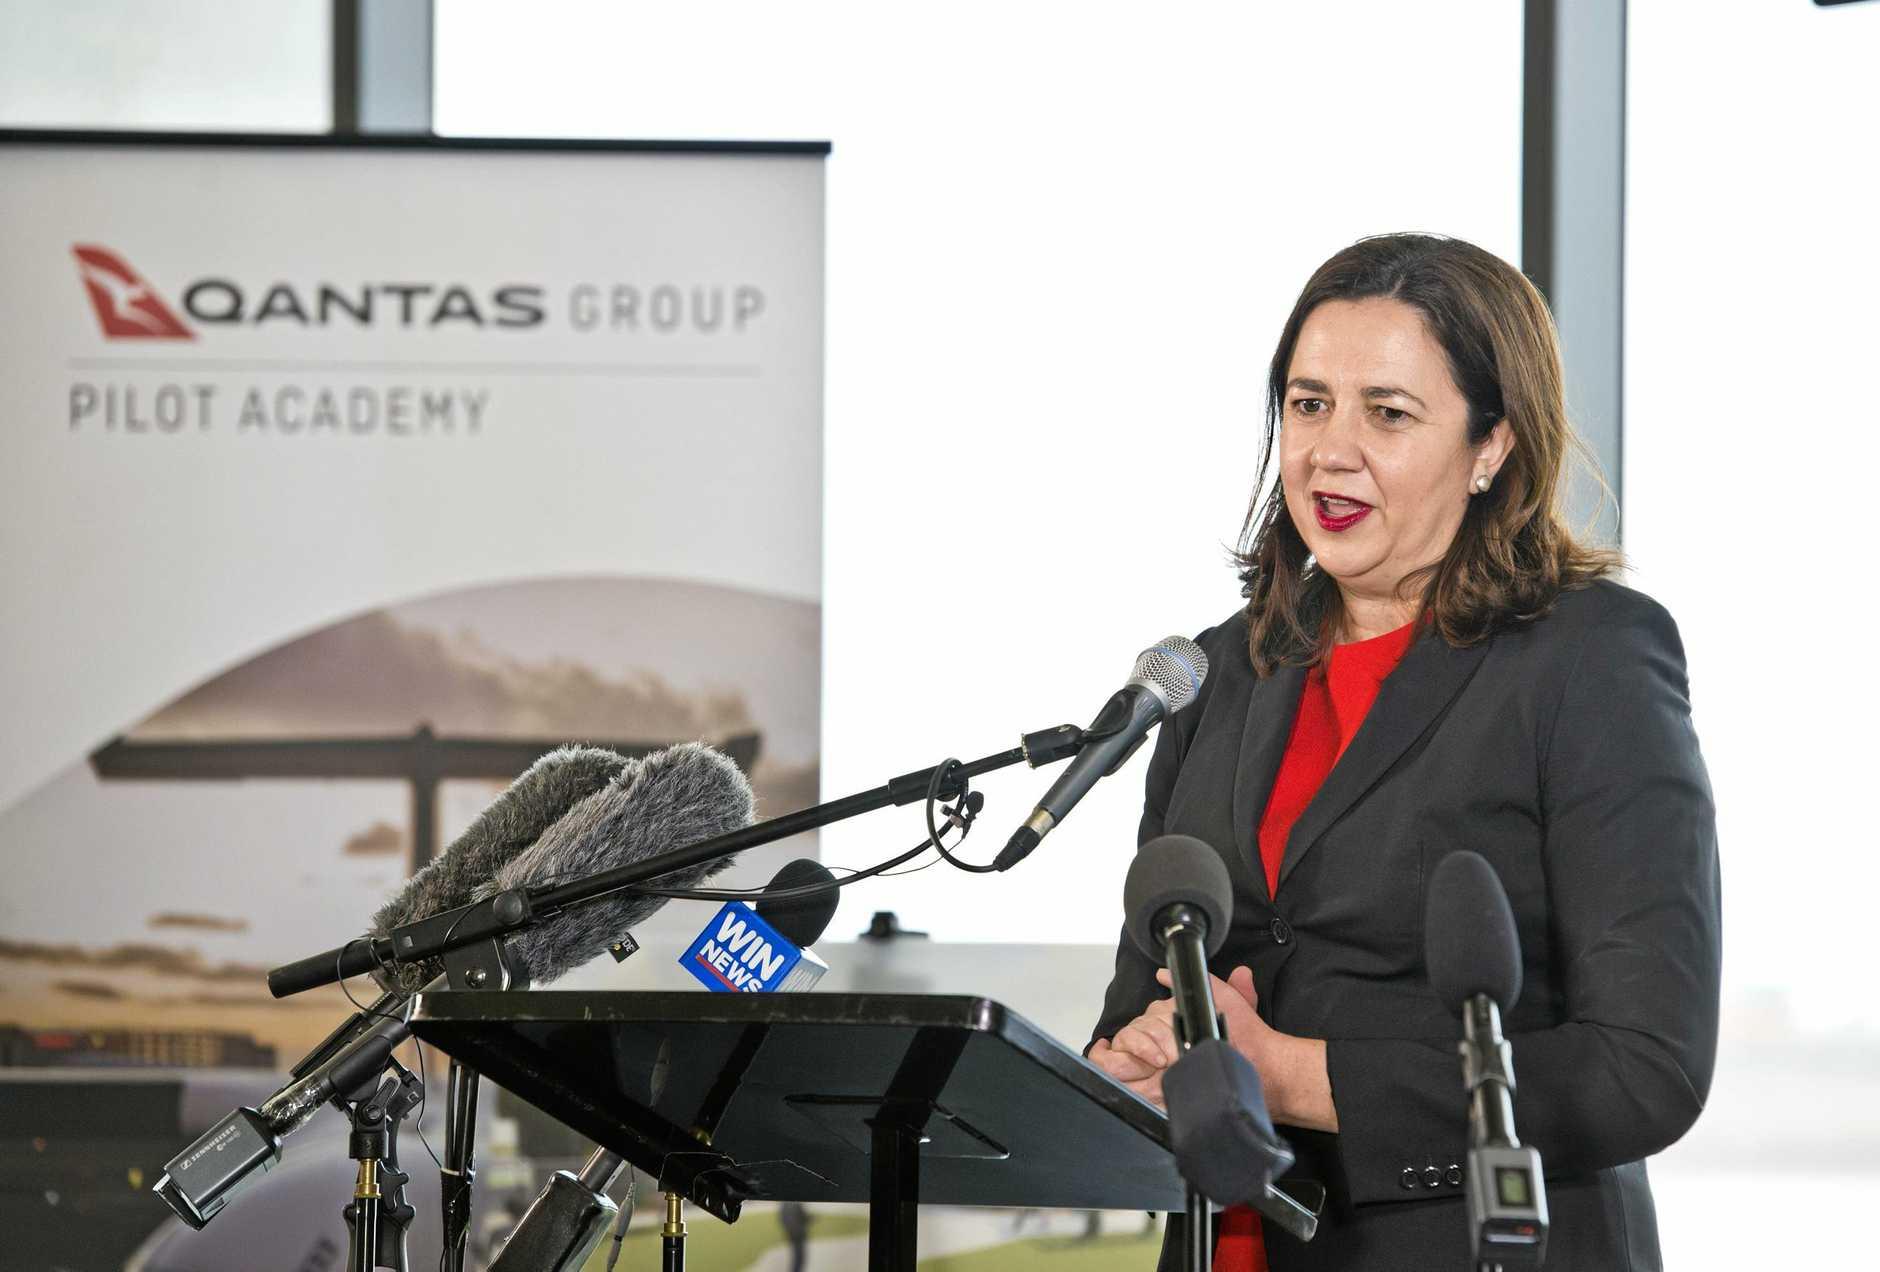 Qld Premier Annastacia Palaszczuk. Qantas pilot training academy announced for Wellcamp airport. Thursday, 27th Sep, 2018.